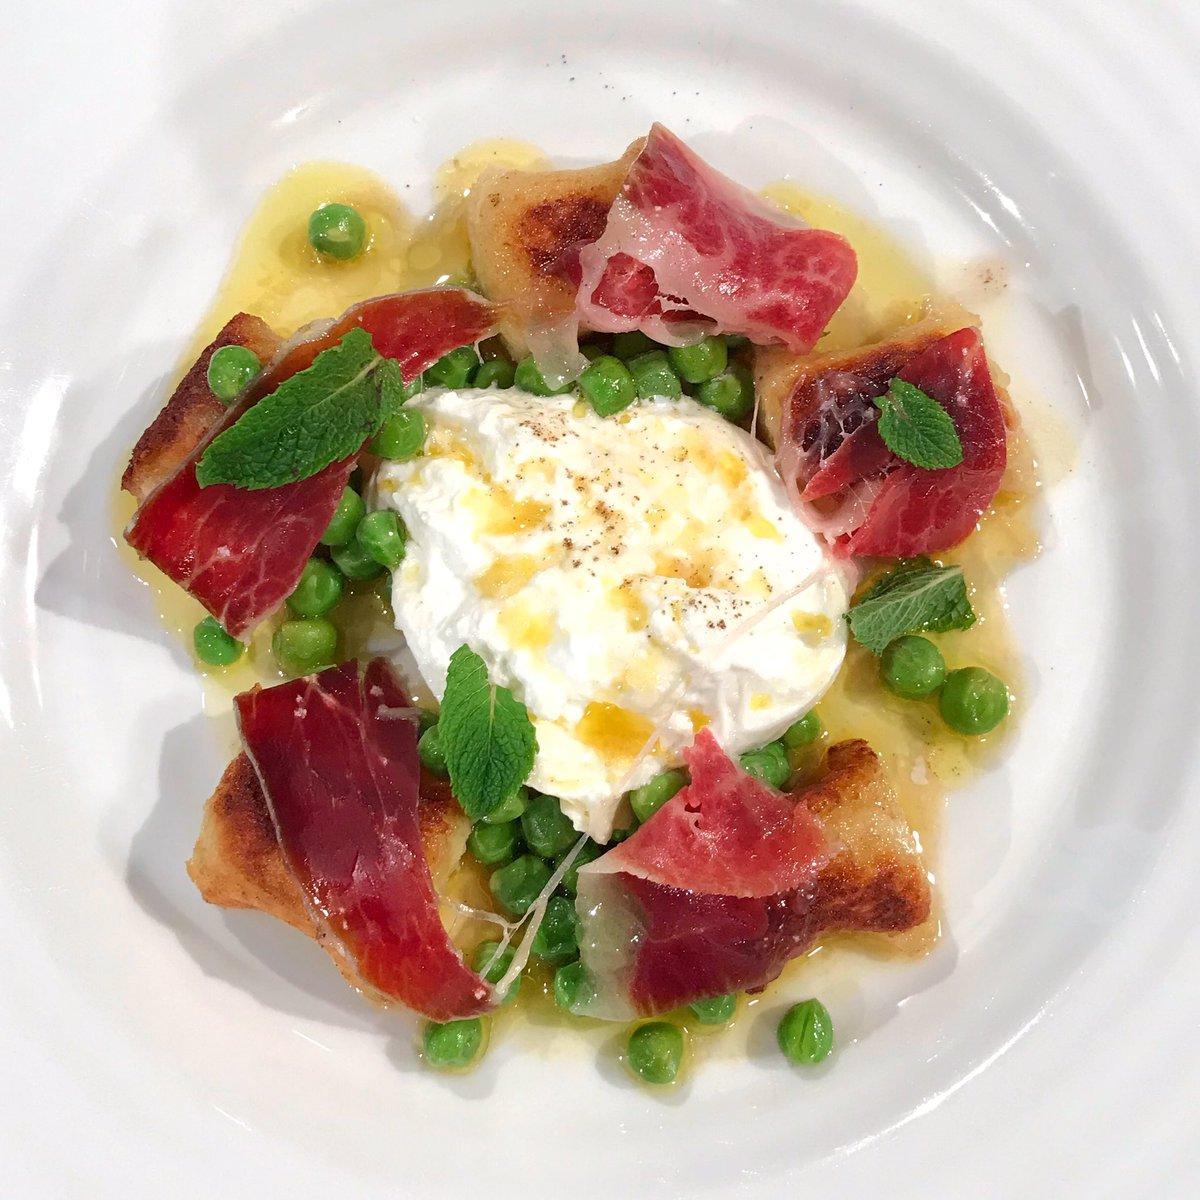 Bryn's potato gnocchi with ham, peas and burrata!   Head this way for the recipe: https://t.co/YtfSbBoPyu  #SaturdayKitchen @Brynwchef @BBCFood https://t.co/2t0BOBrKVd